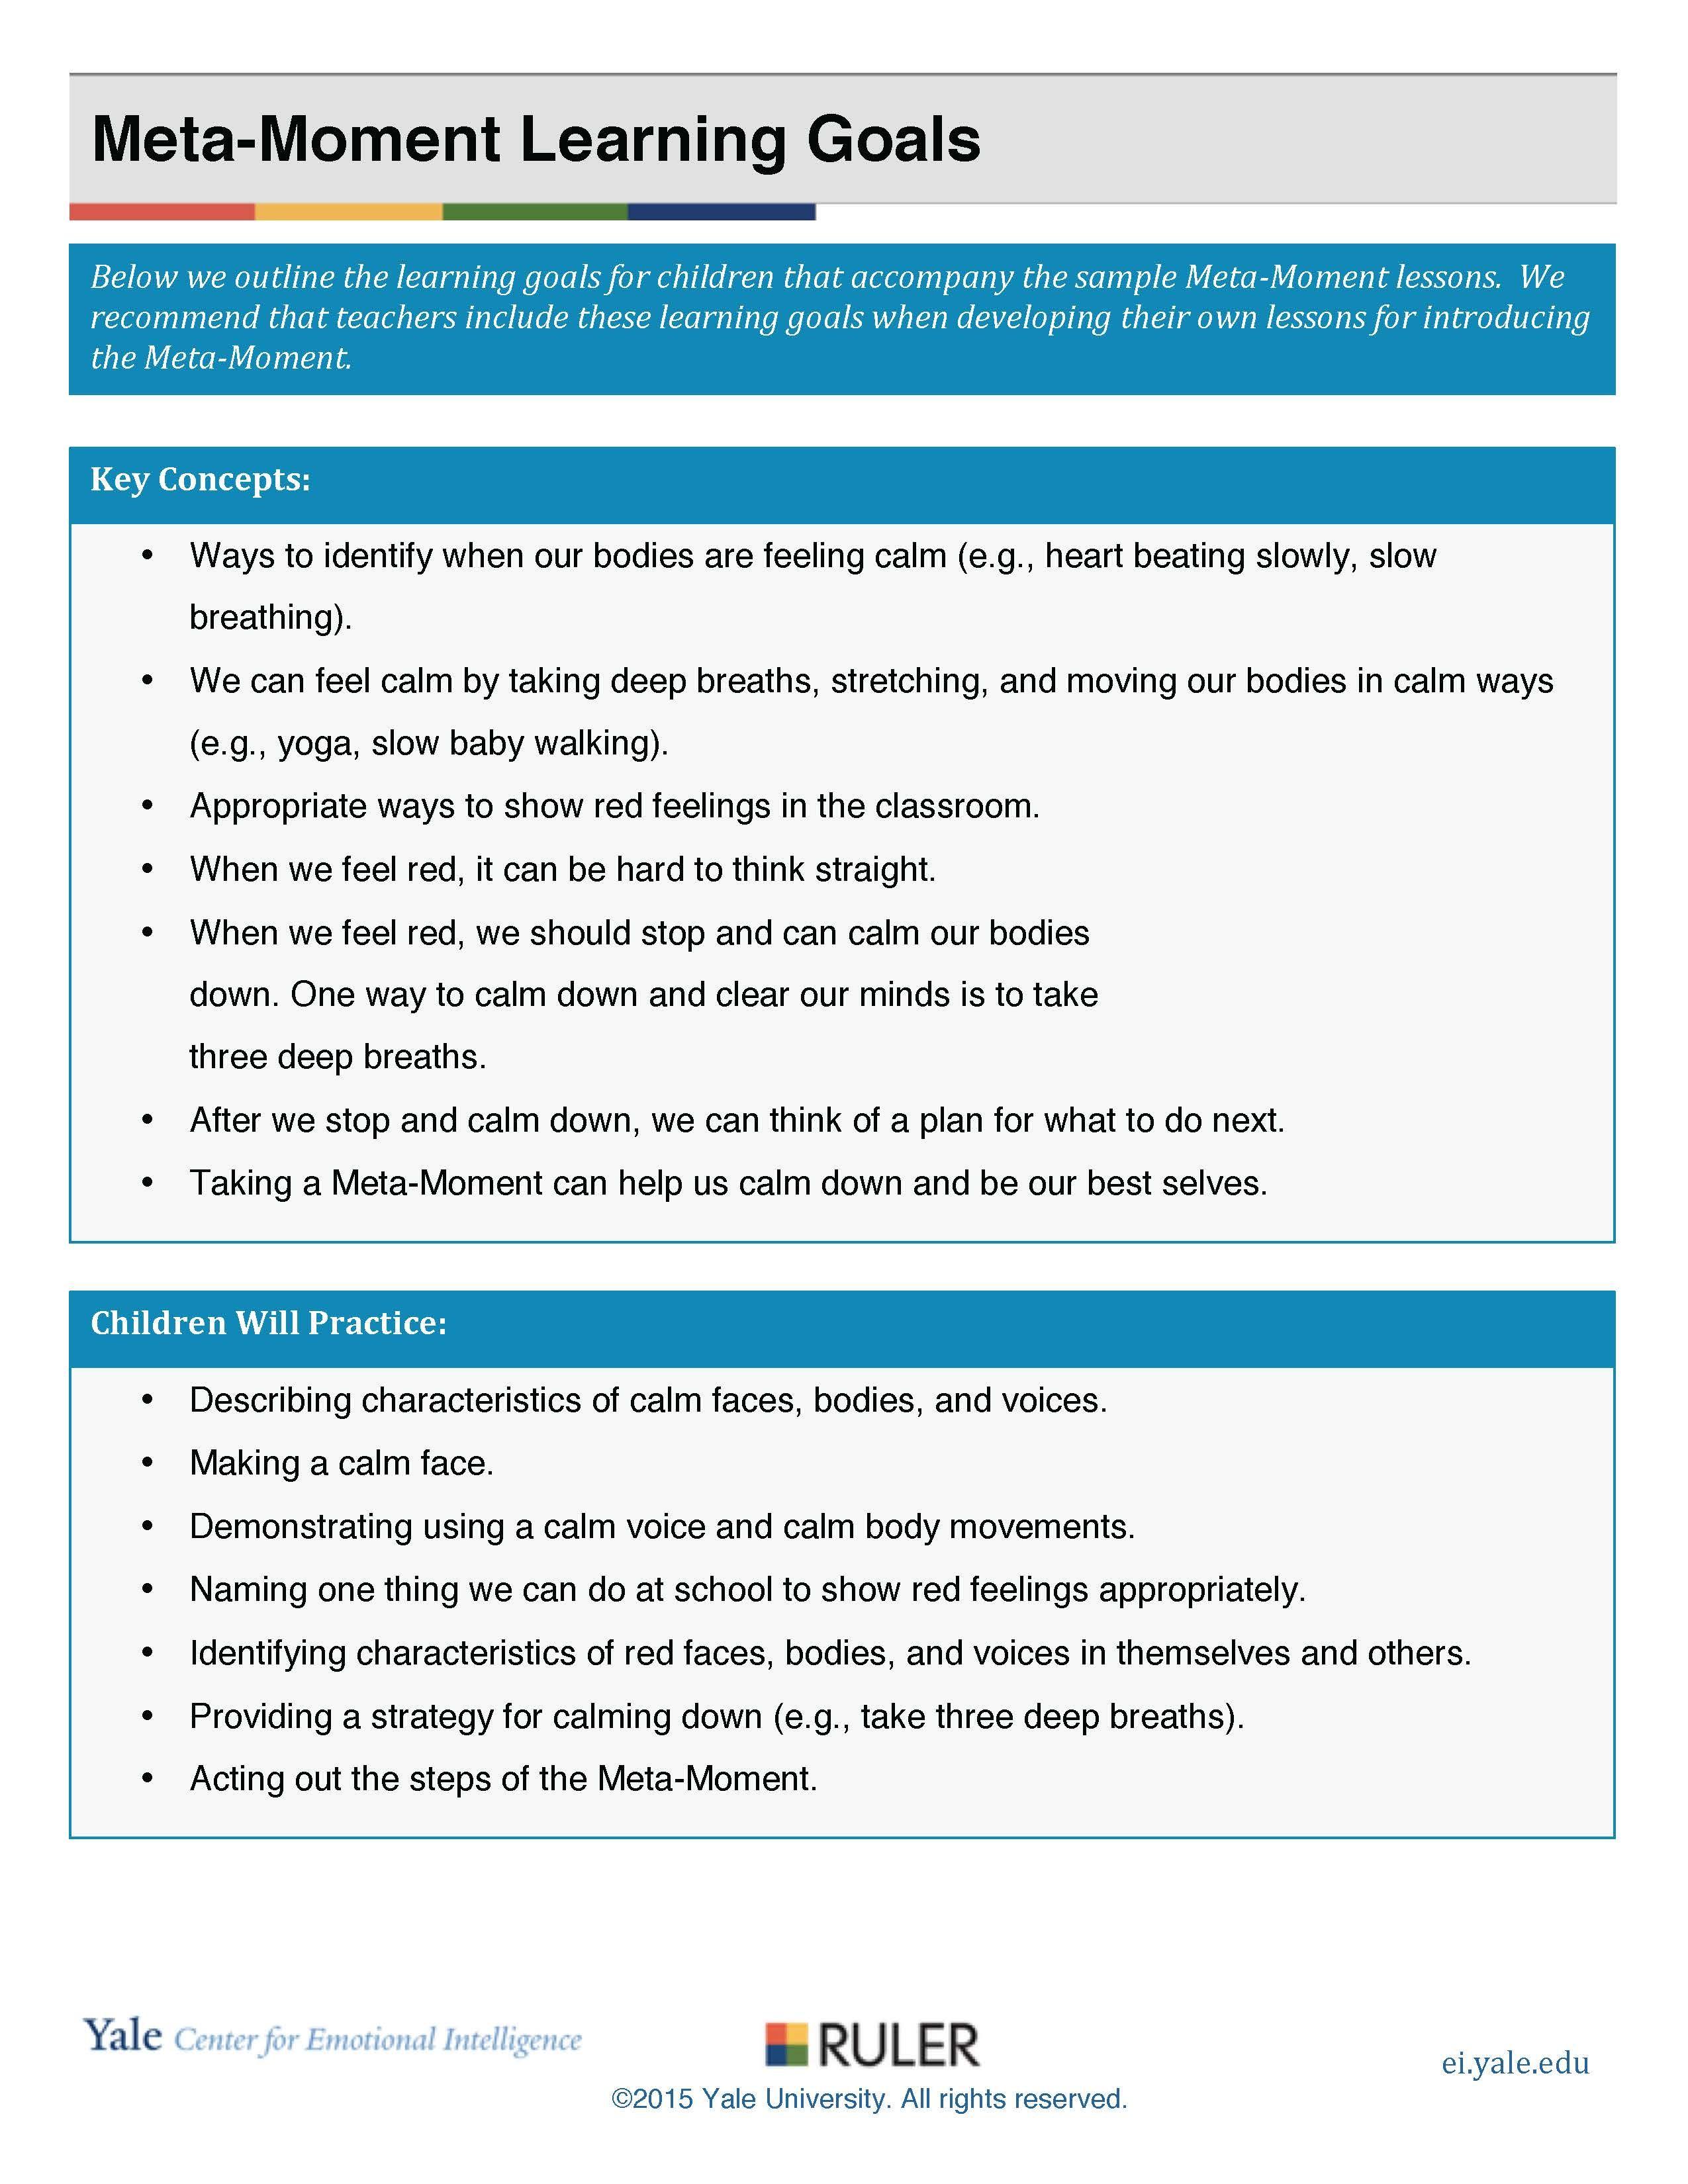 Meta Moment Learning Goals1 Preschool